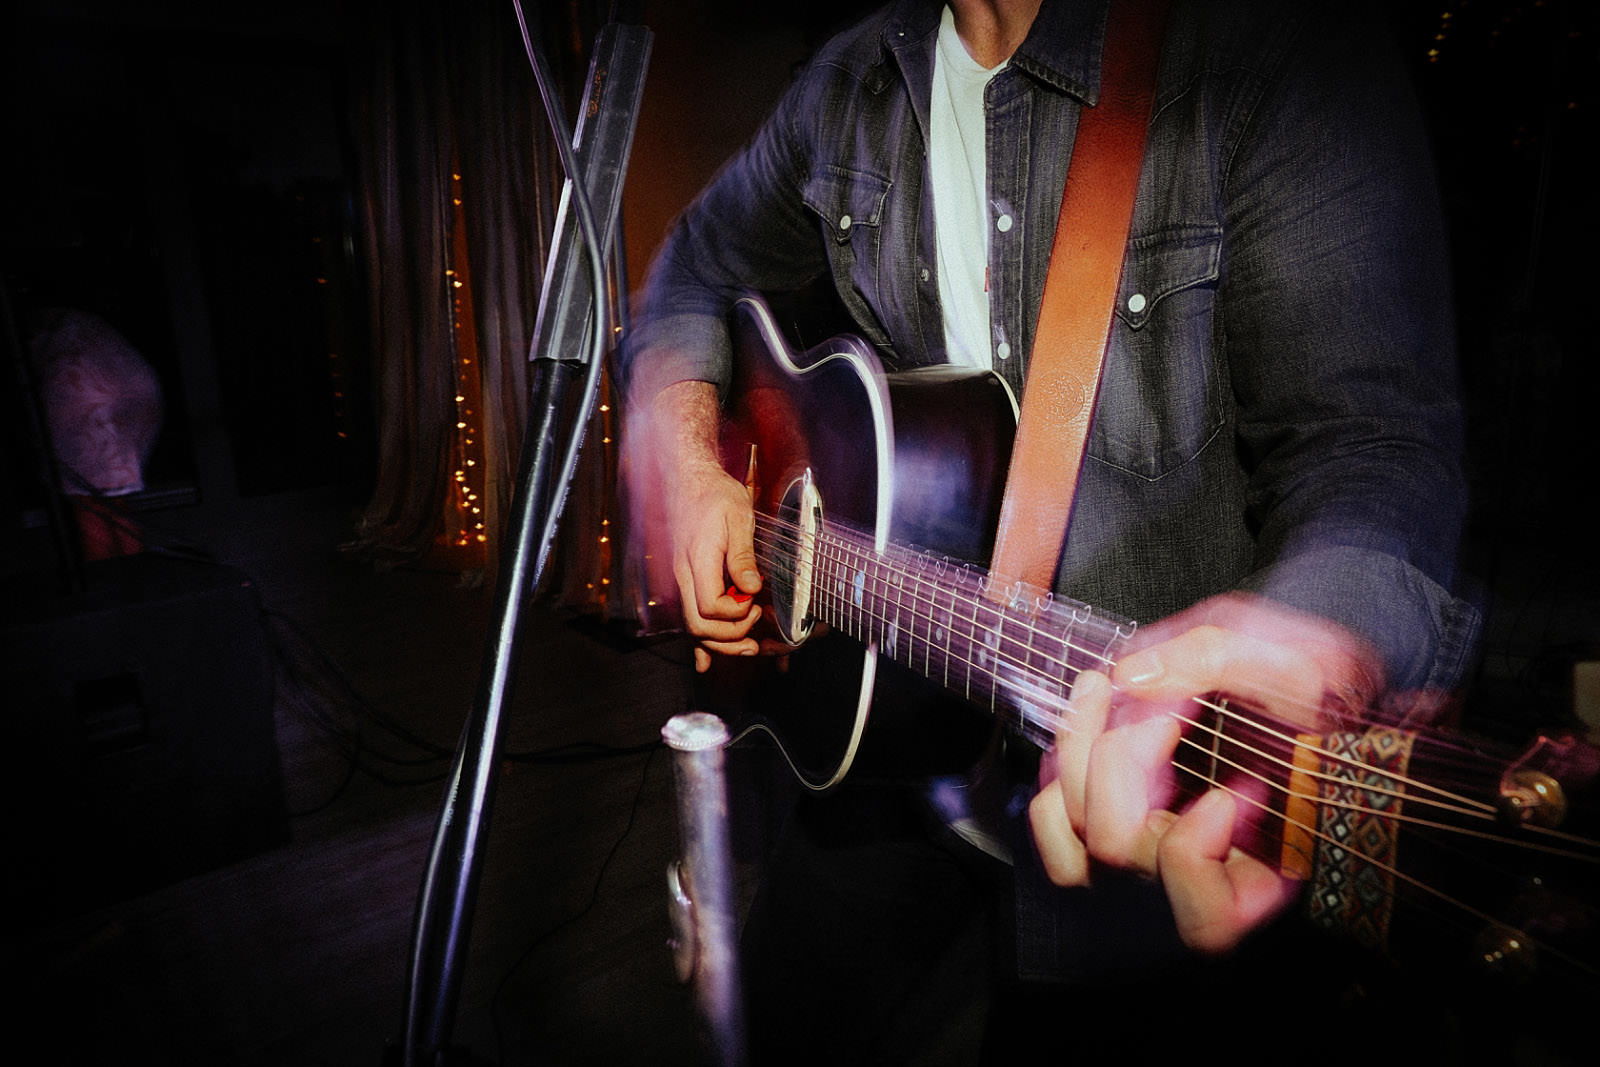 callum mac hands on guitar